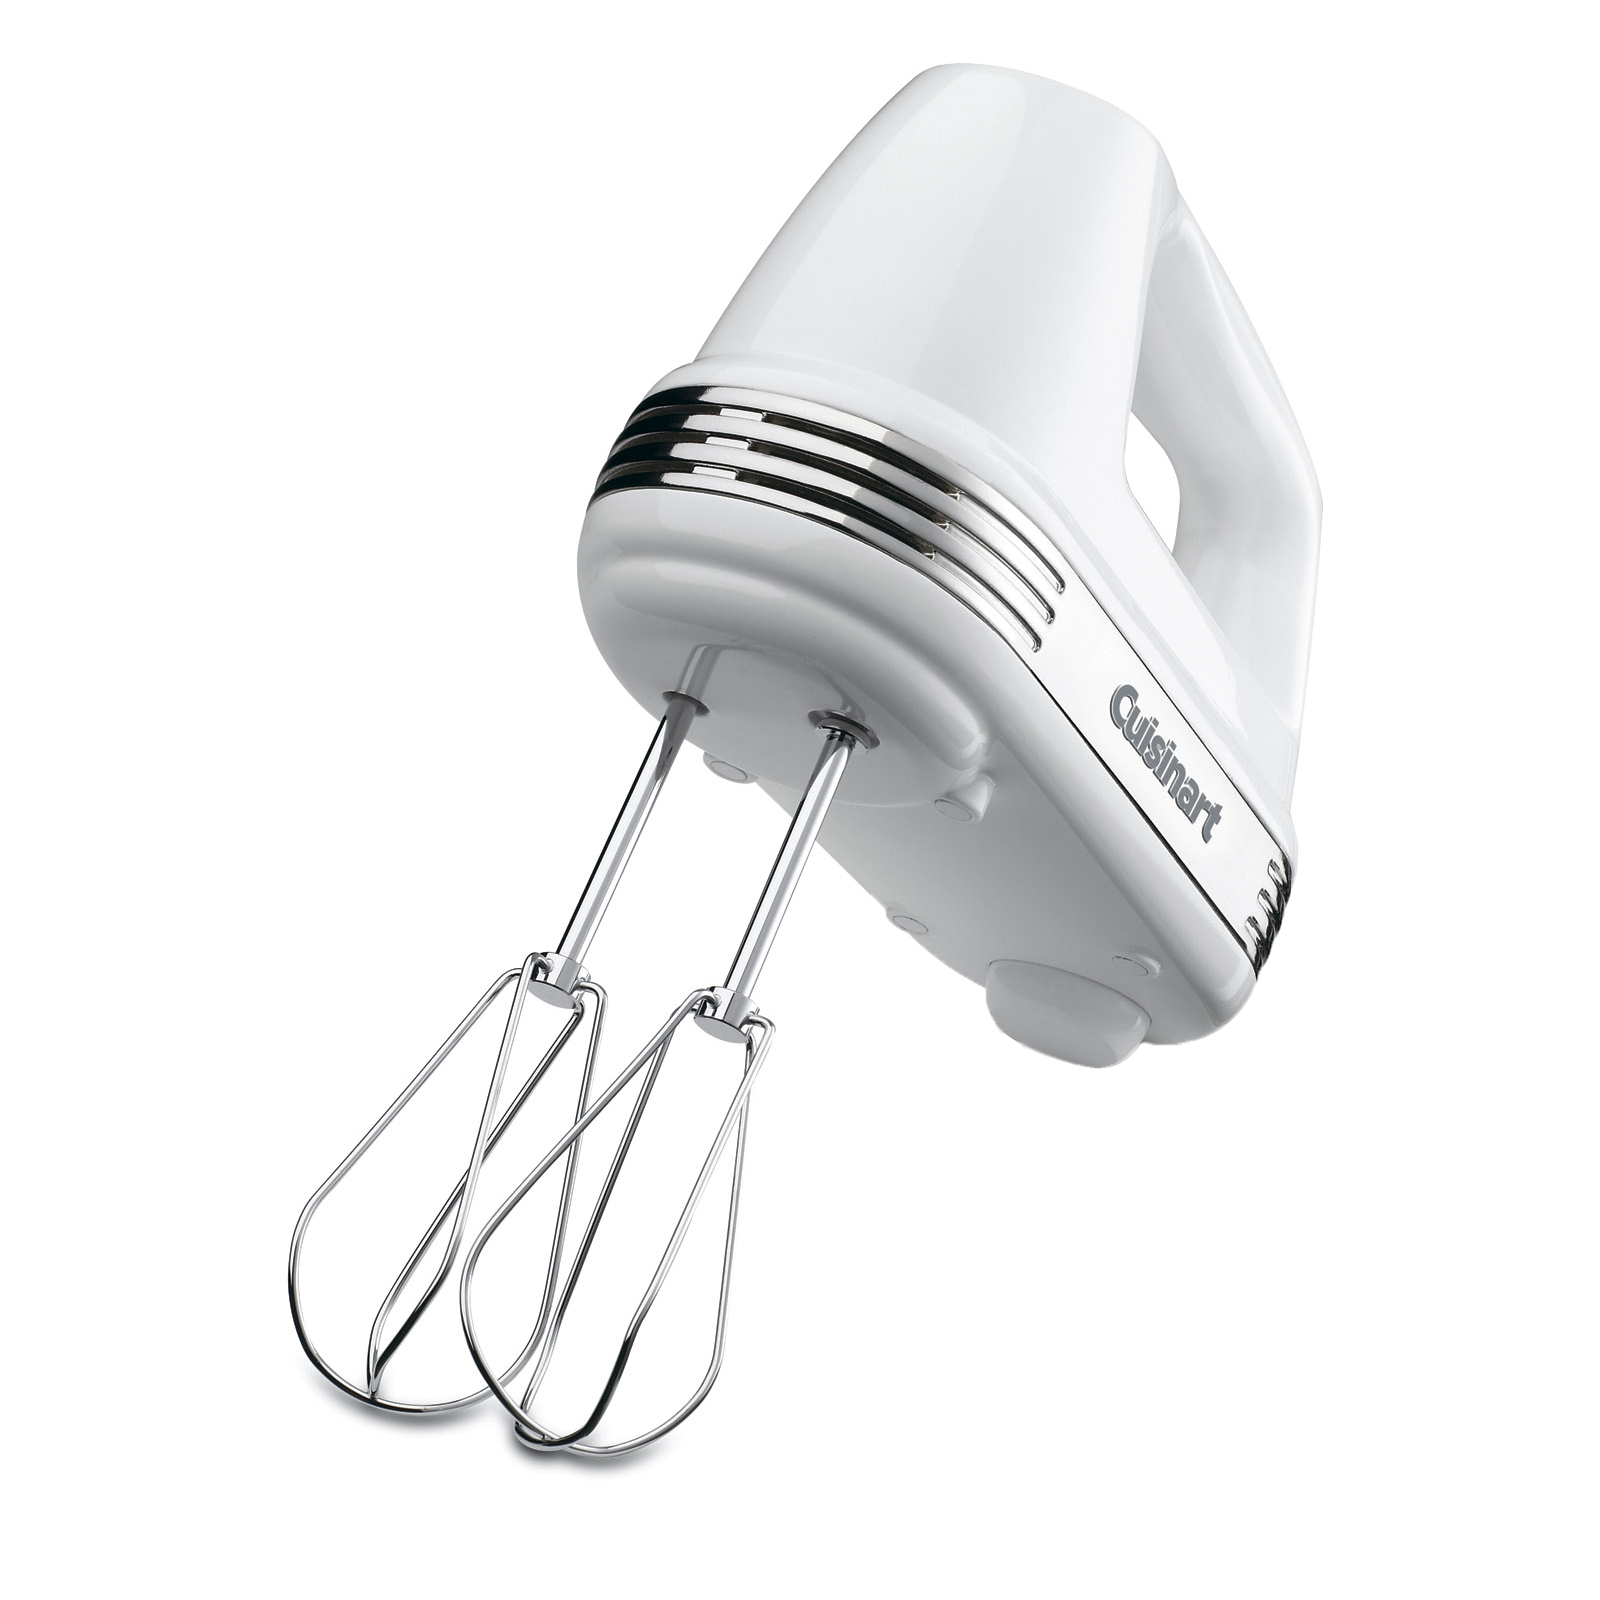 Cuisinart Power Advantage 5-Speed 220-Watt Hand Mixer, White